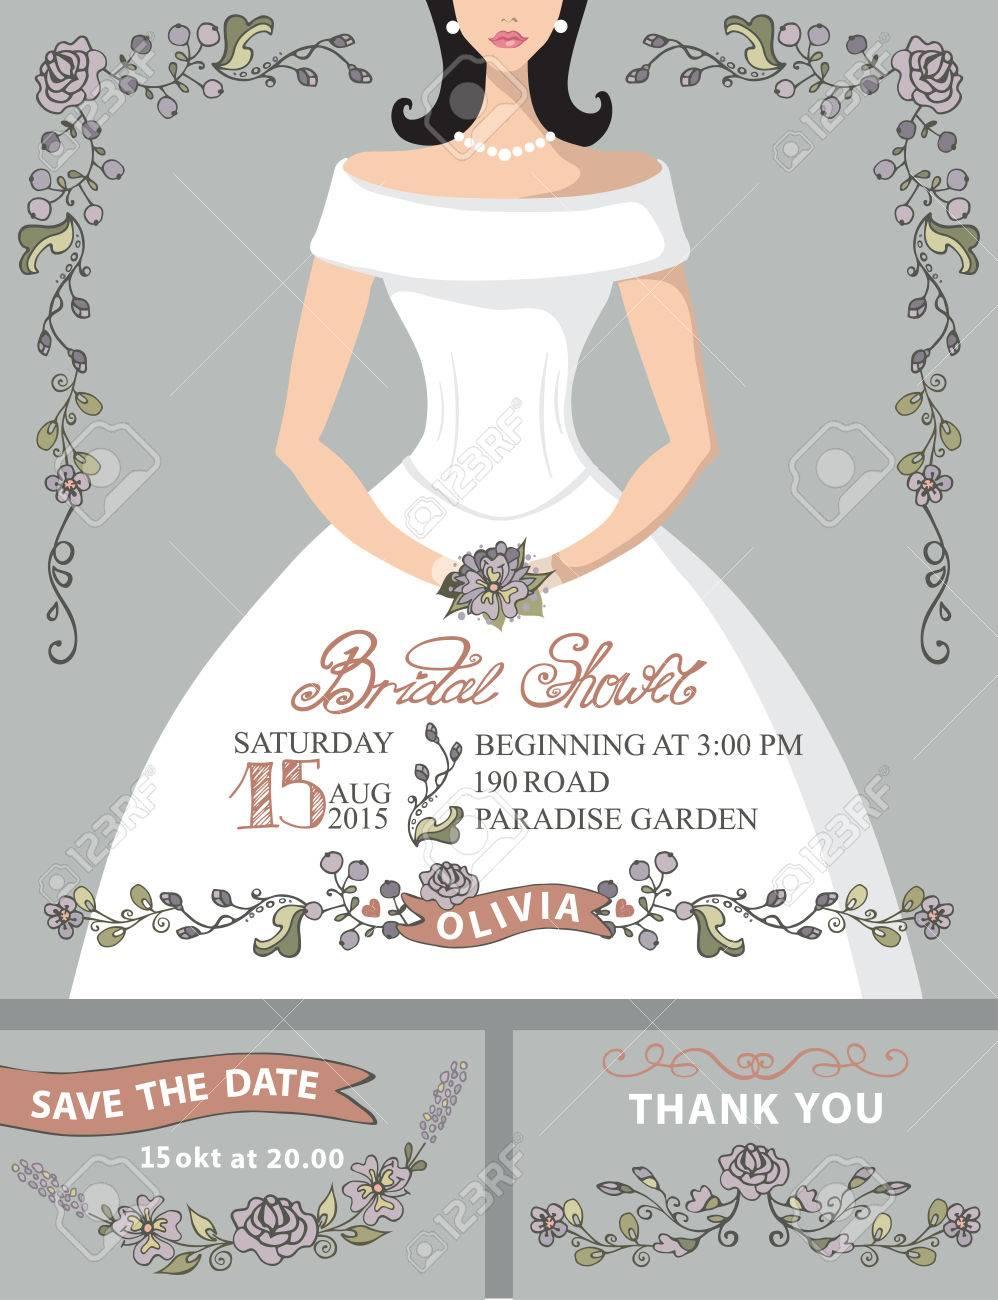 Bridal Shower Invitation Set.Bride Portrait,vintage Floral Decor ...